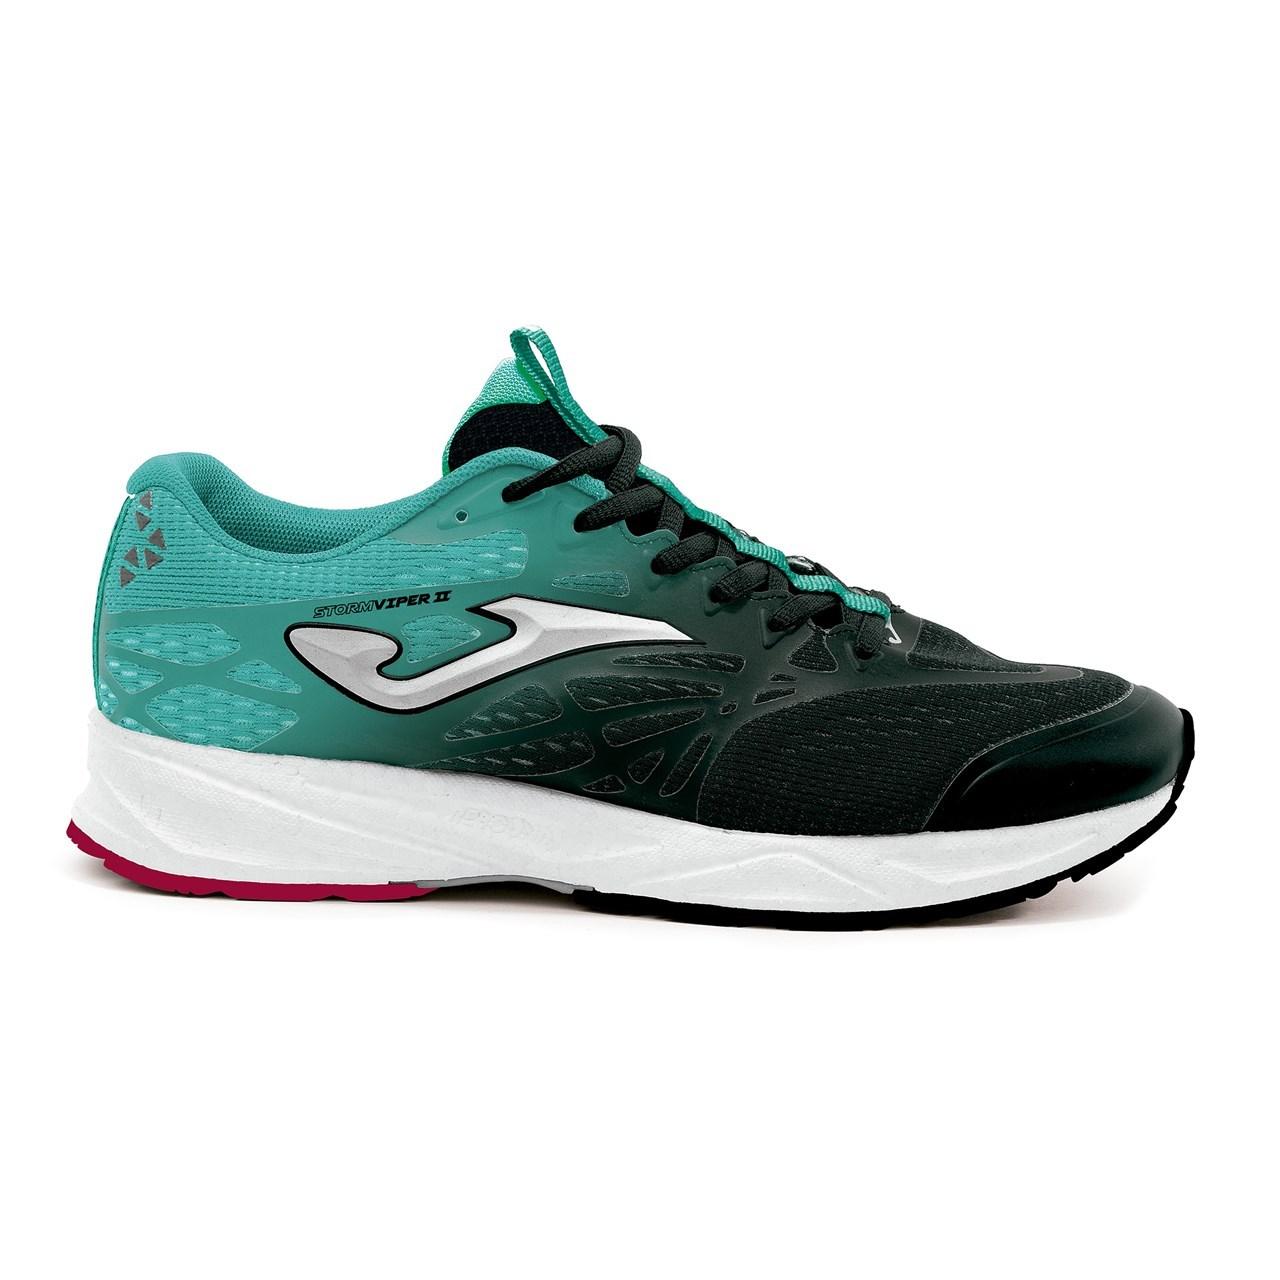 Pantofi sport alergare Barbati imagine